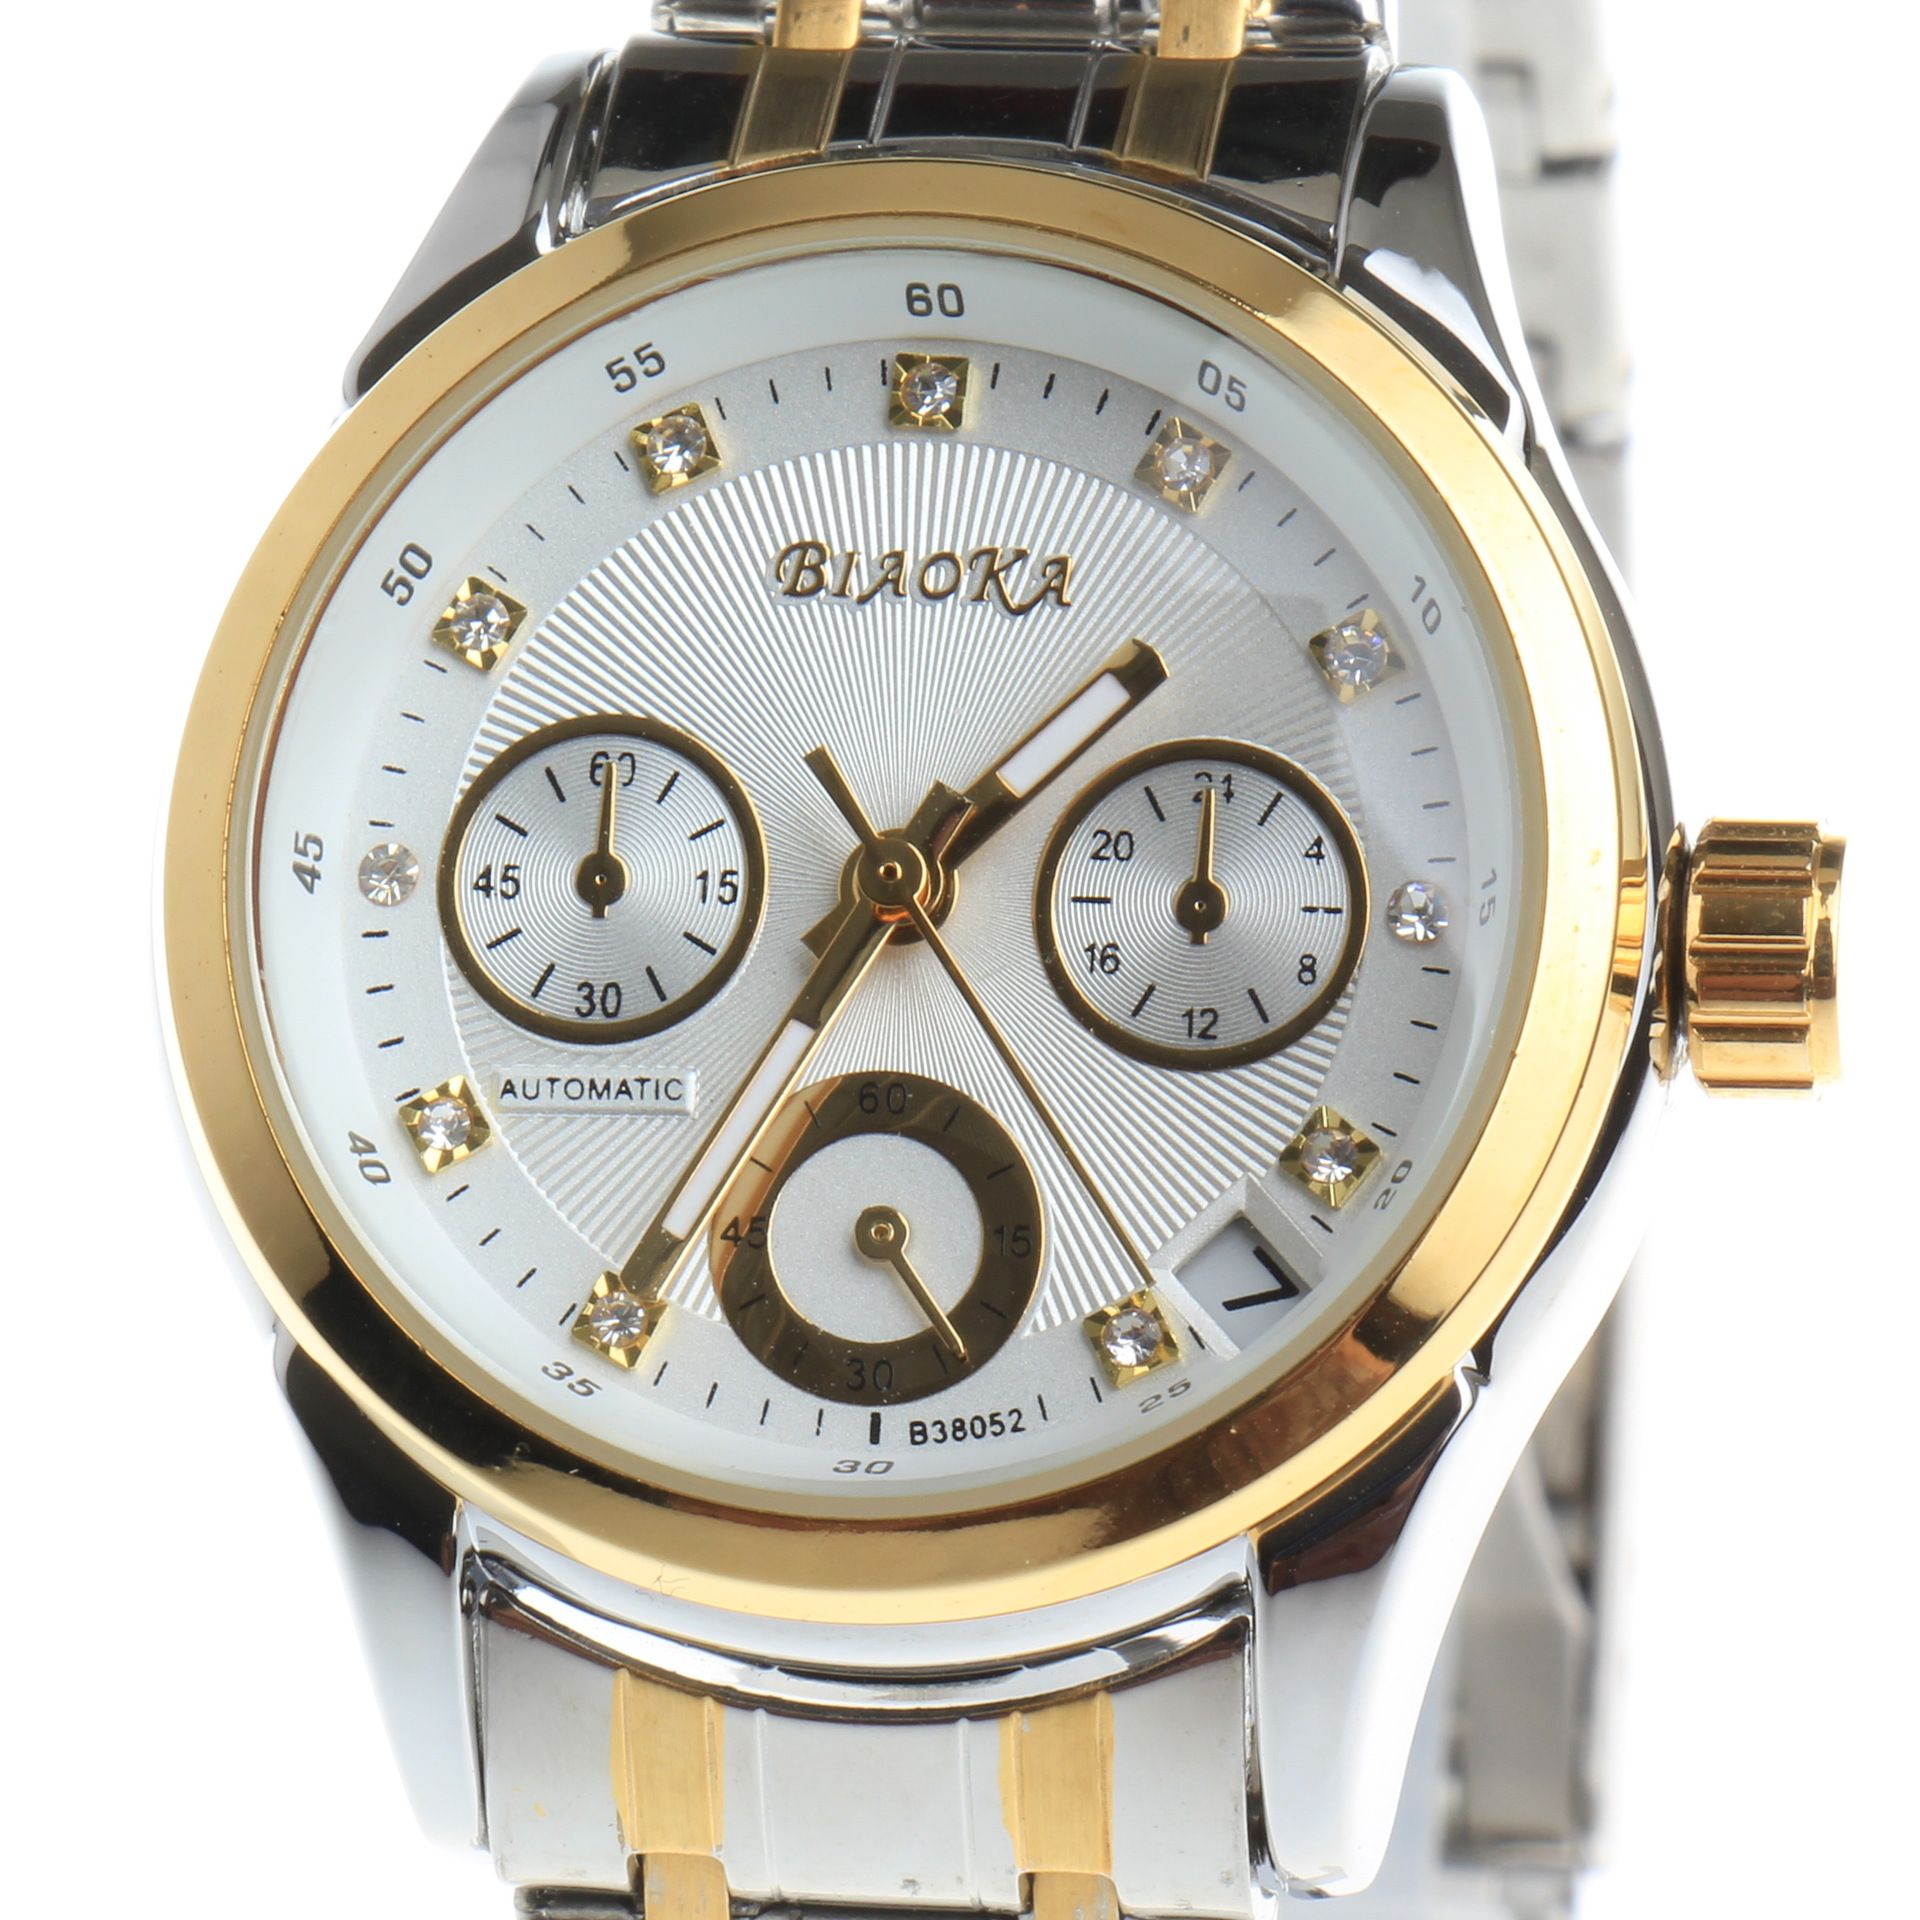 2018 NEWEST BIAOKA gold mechanical watch Top Brand Luxury automatic watch women stainless steel skeleton relogio feminino стоимость